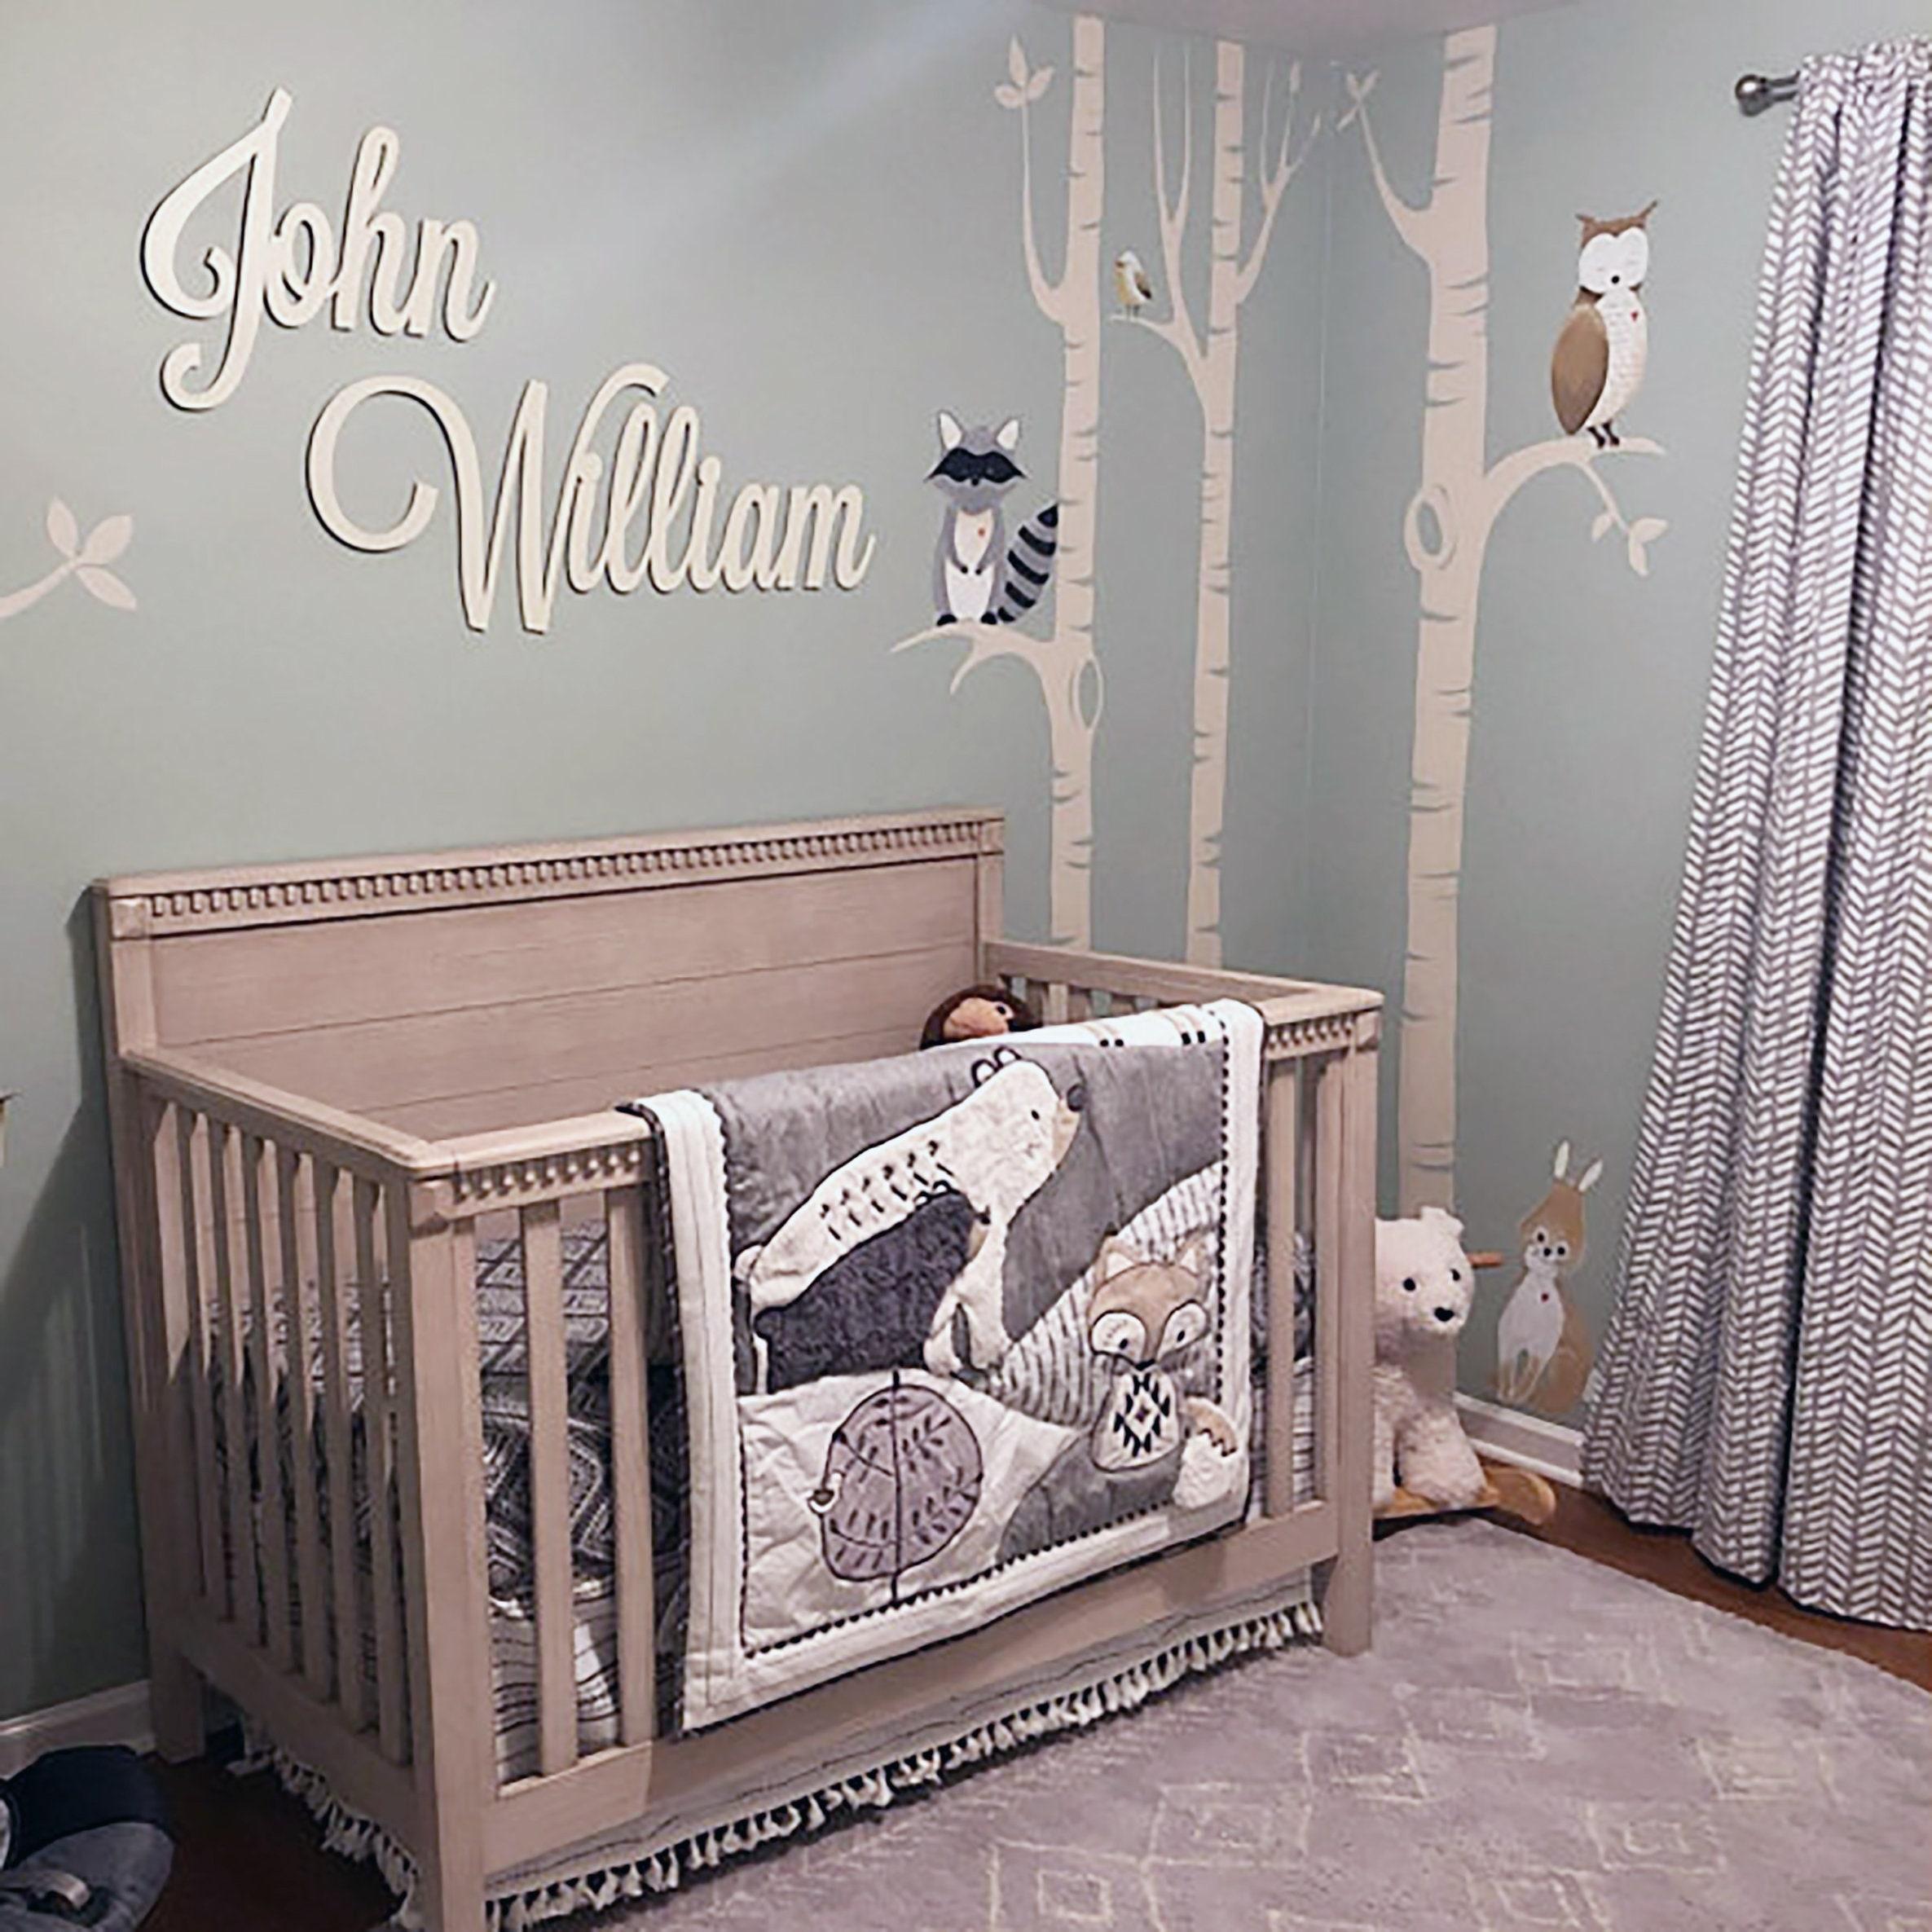 wall decor over crib sign wood cutout 12x12 Square Custom Wood Name Sign name wall sign nursery name sign custom name art name cutout